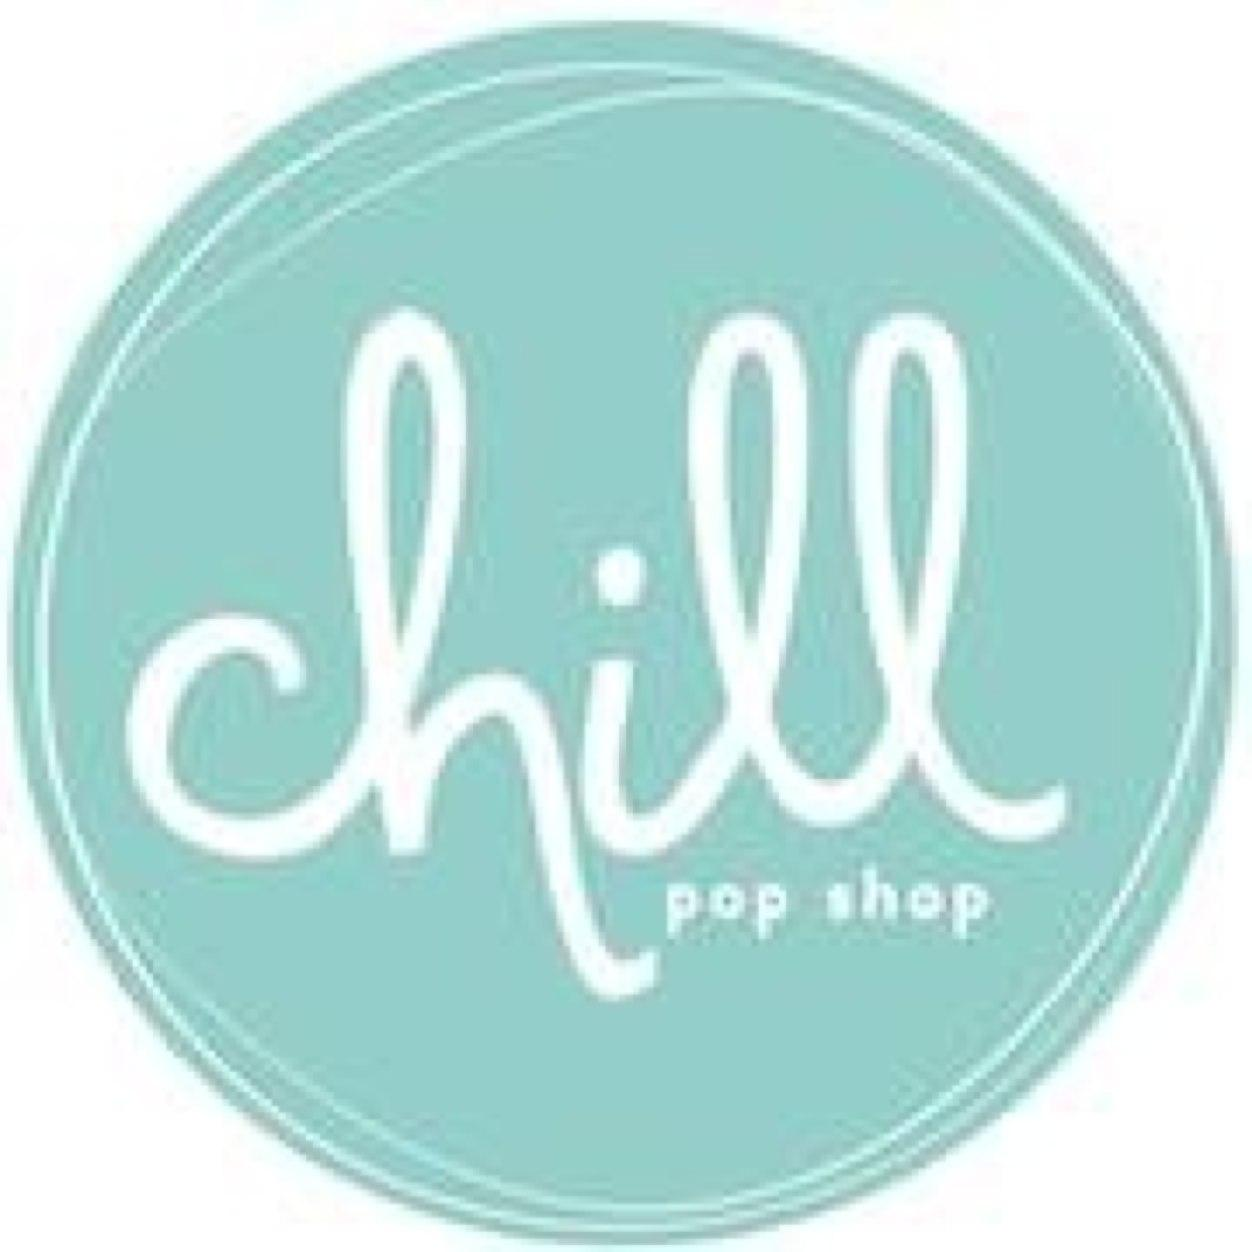 chillpop.jpg